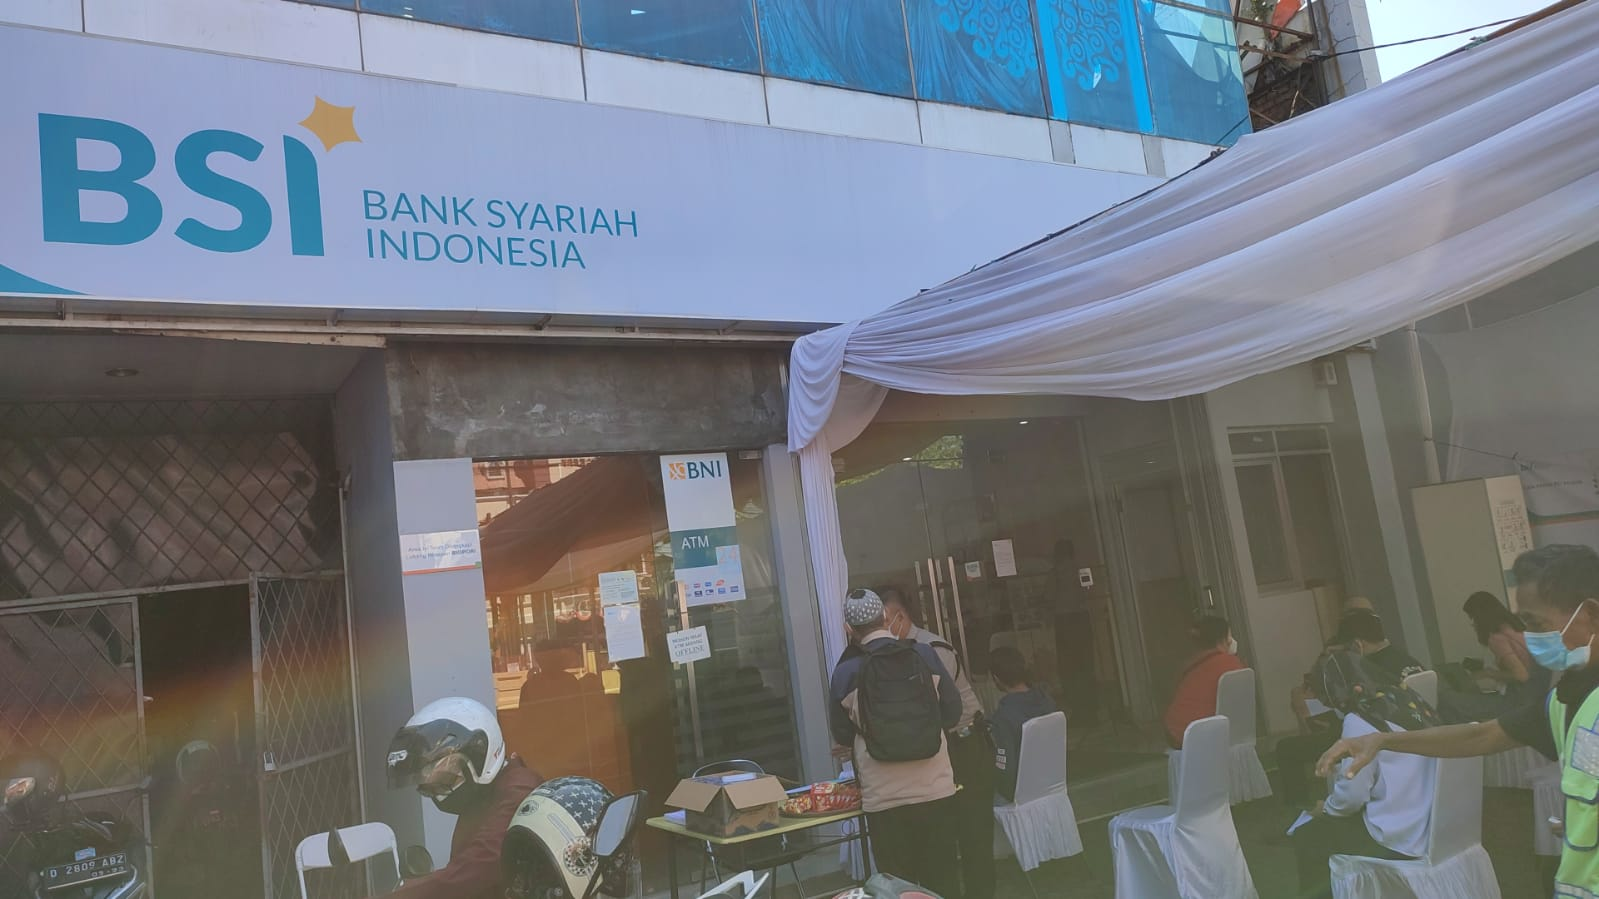 Bank BNI Syariah Cimahi berubah menjadi BSI